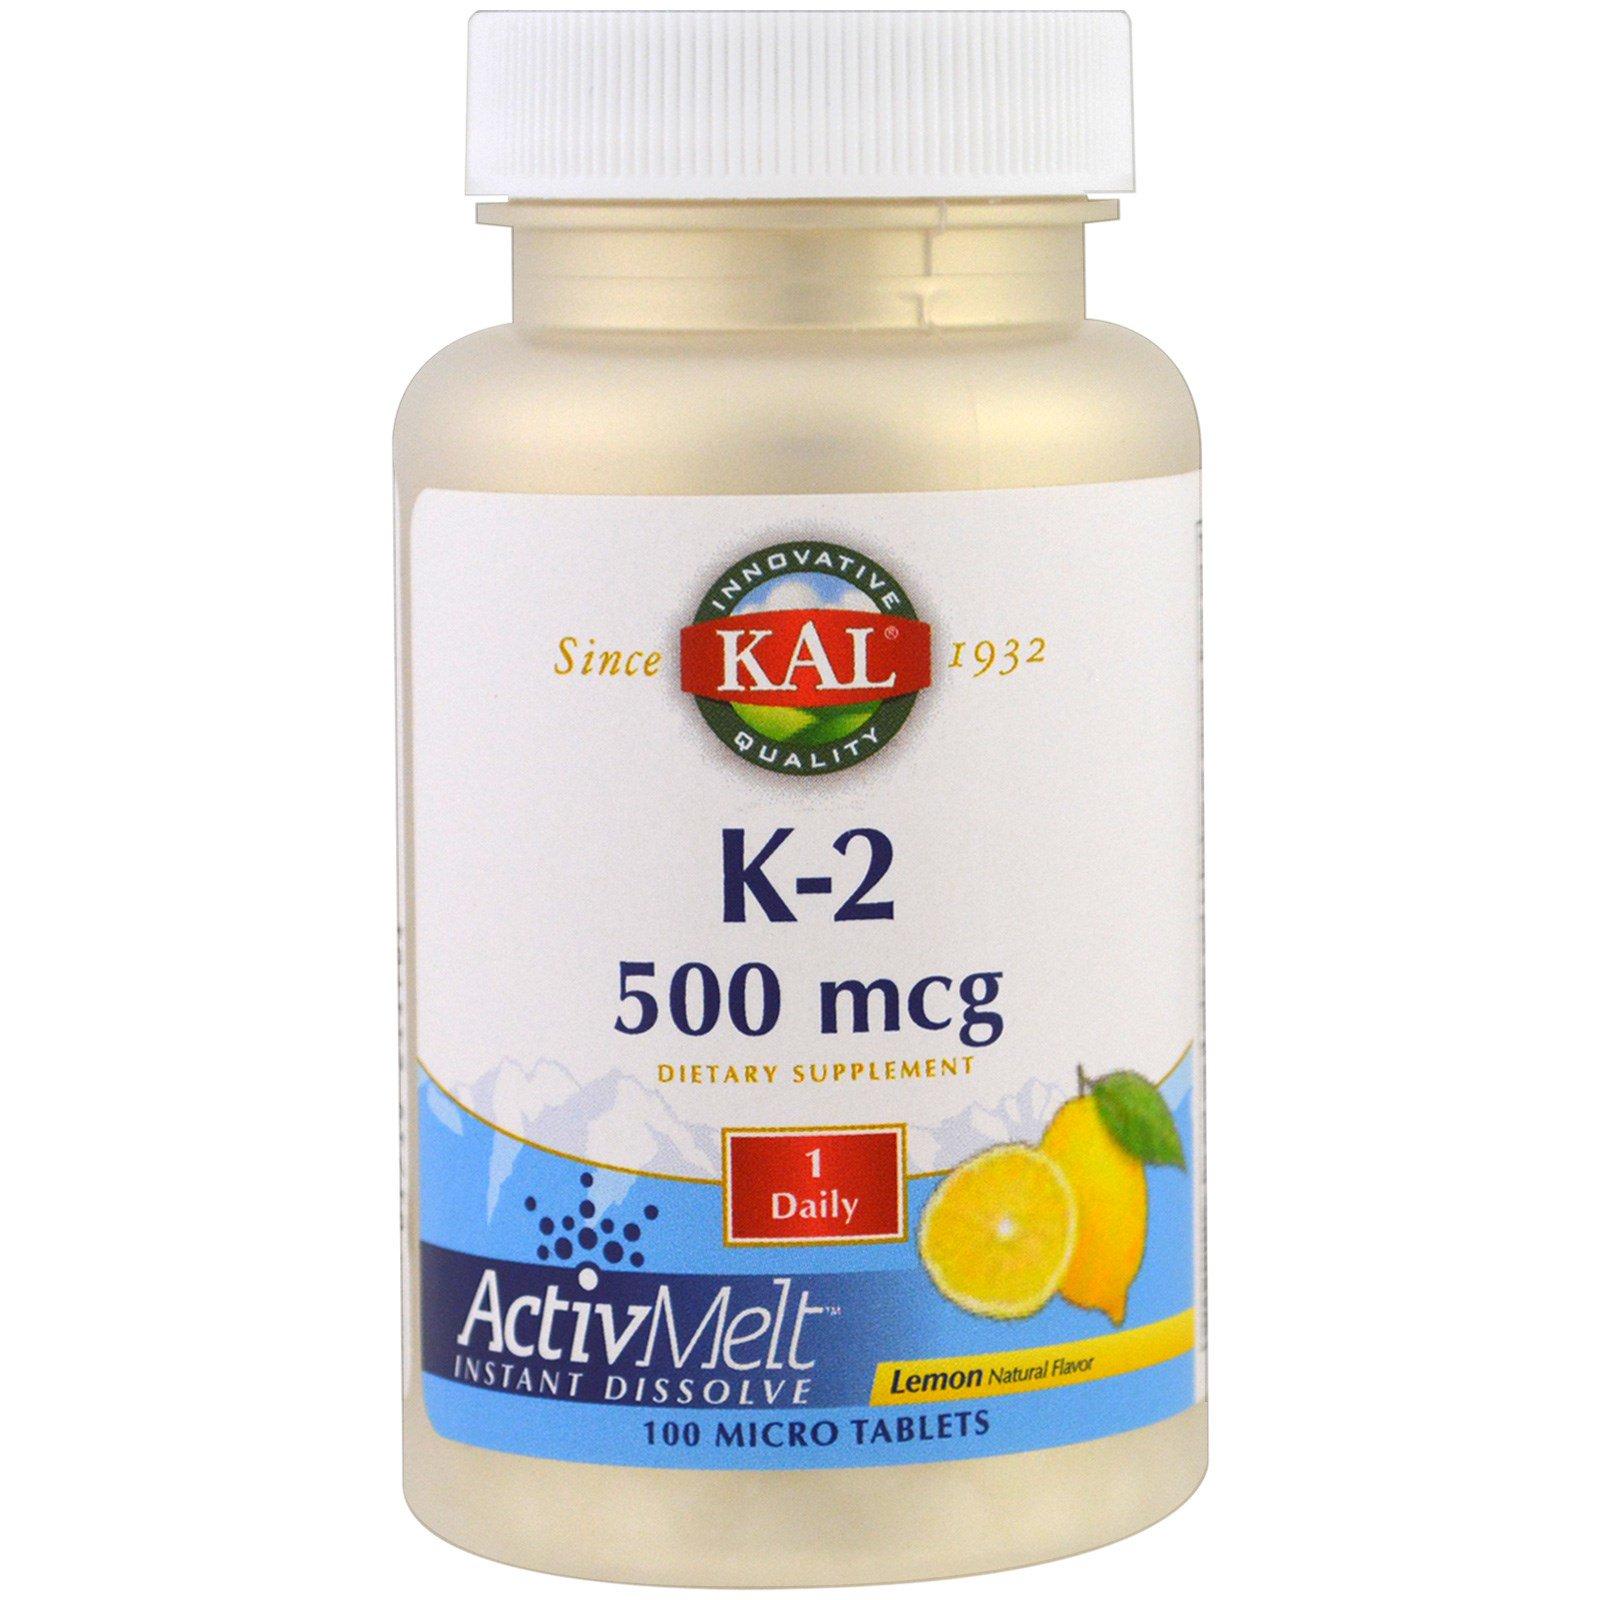 KAL, K-2, Lemon, 500 mcg, 100 Micro Tablets